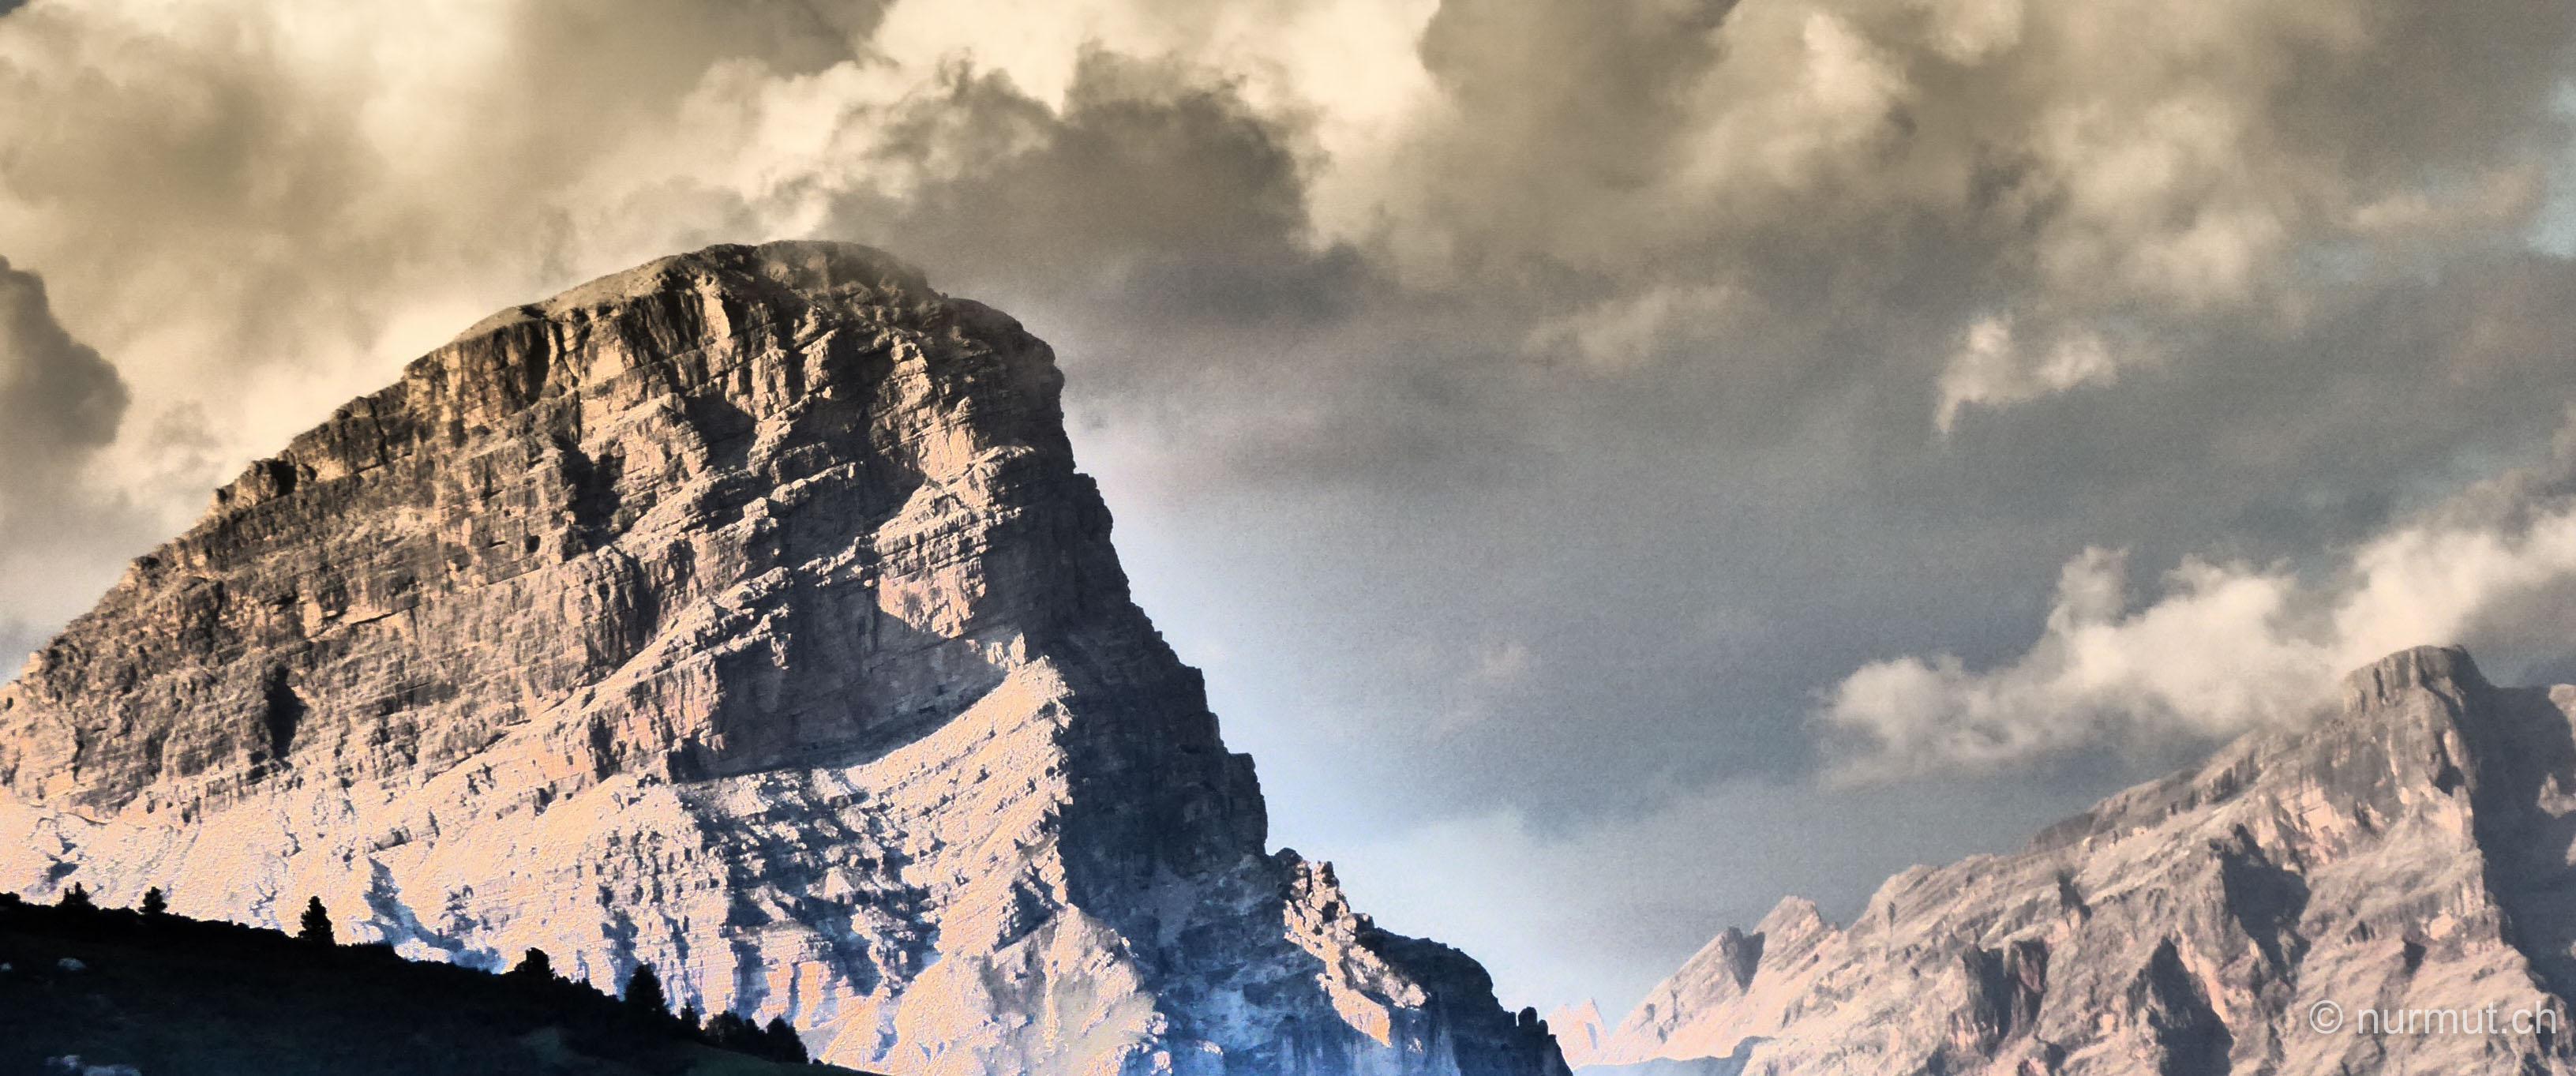 nurmut.ch-gewitterwolken-dolomiiten